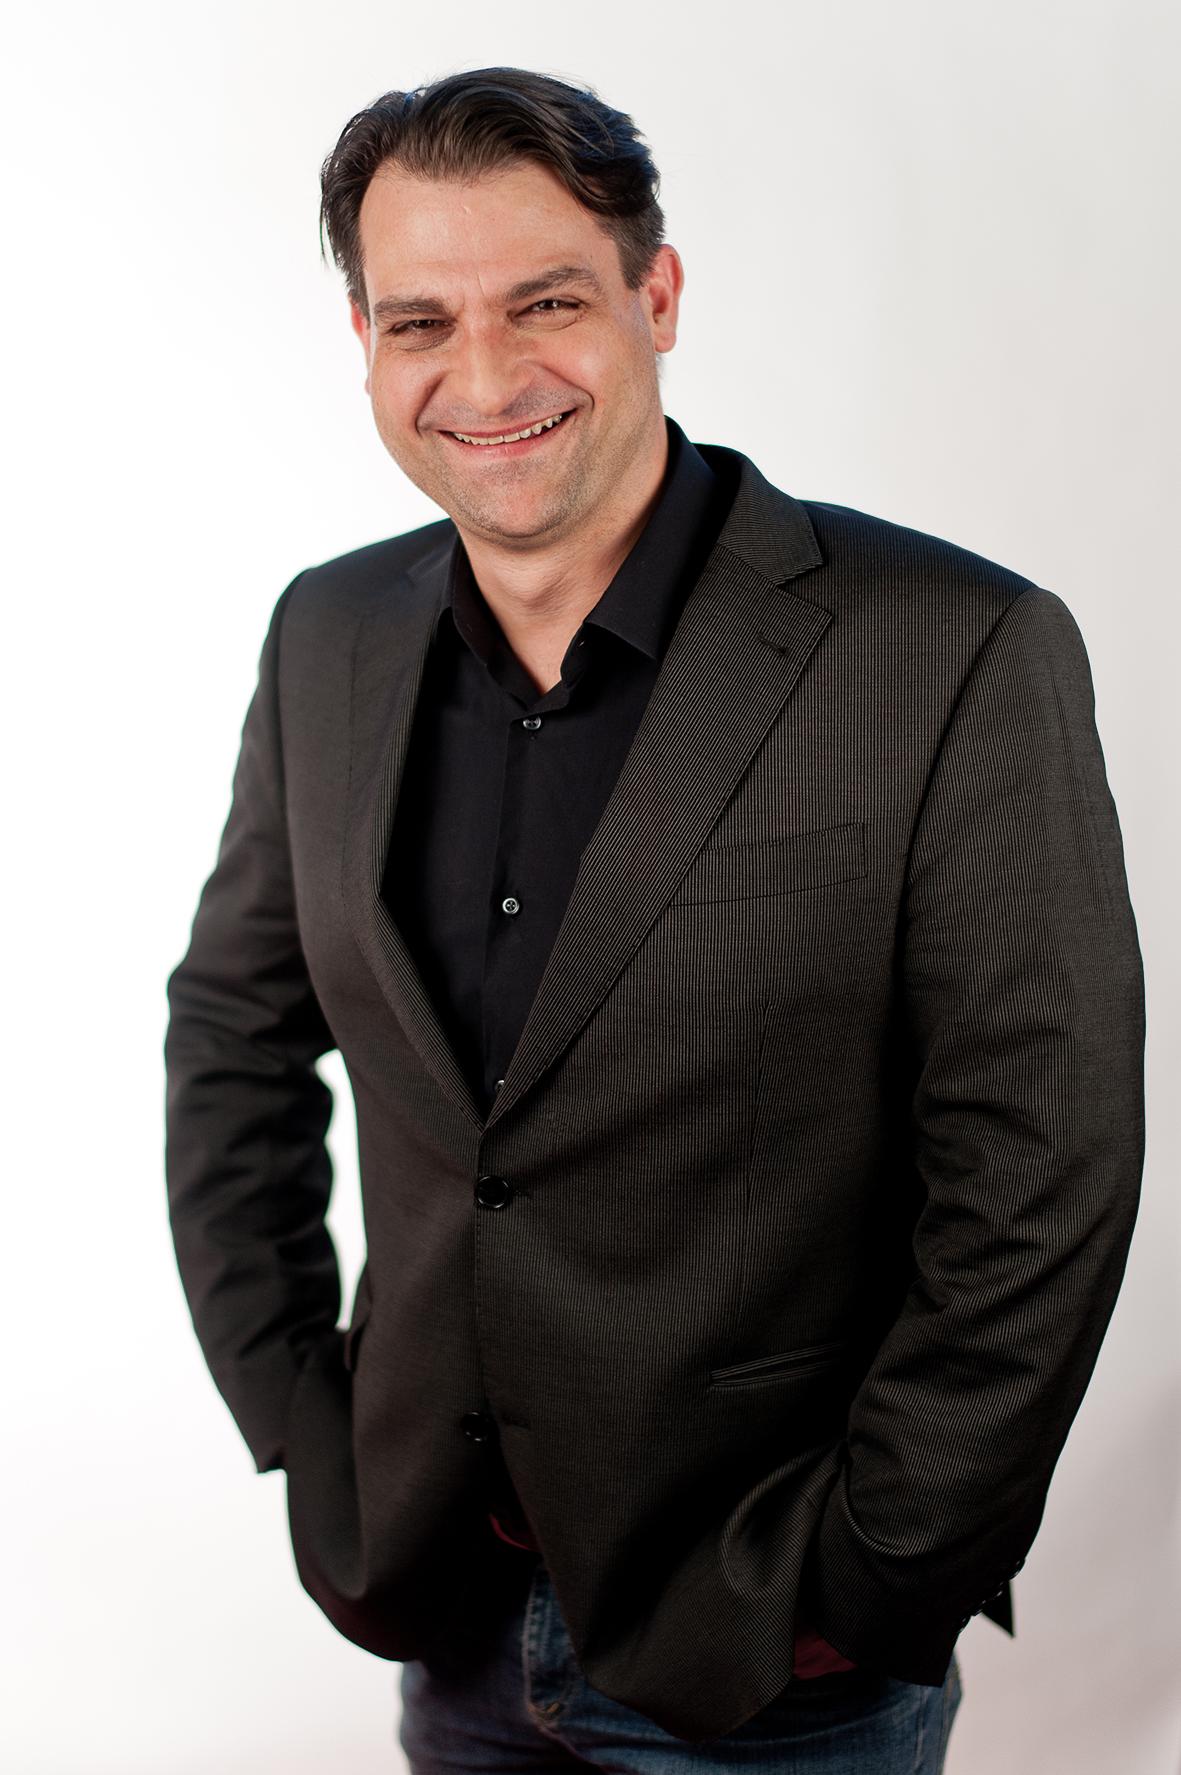 Paul Tranziska